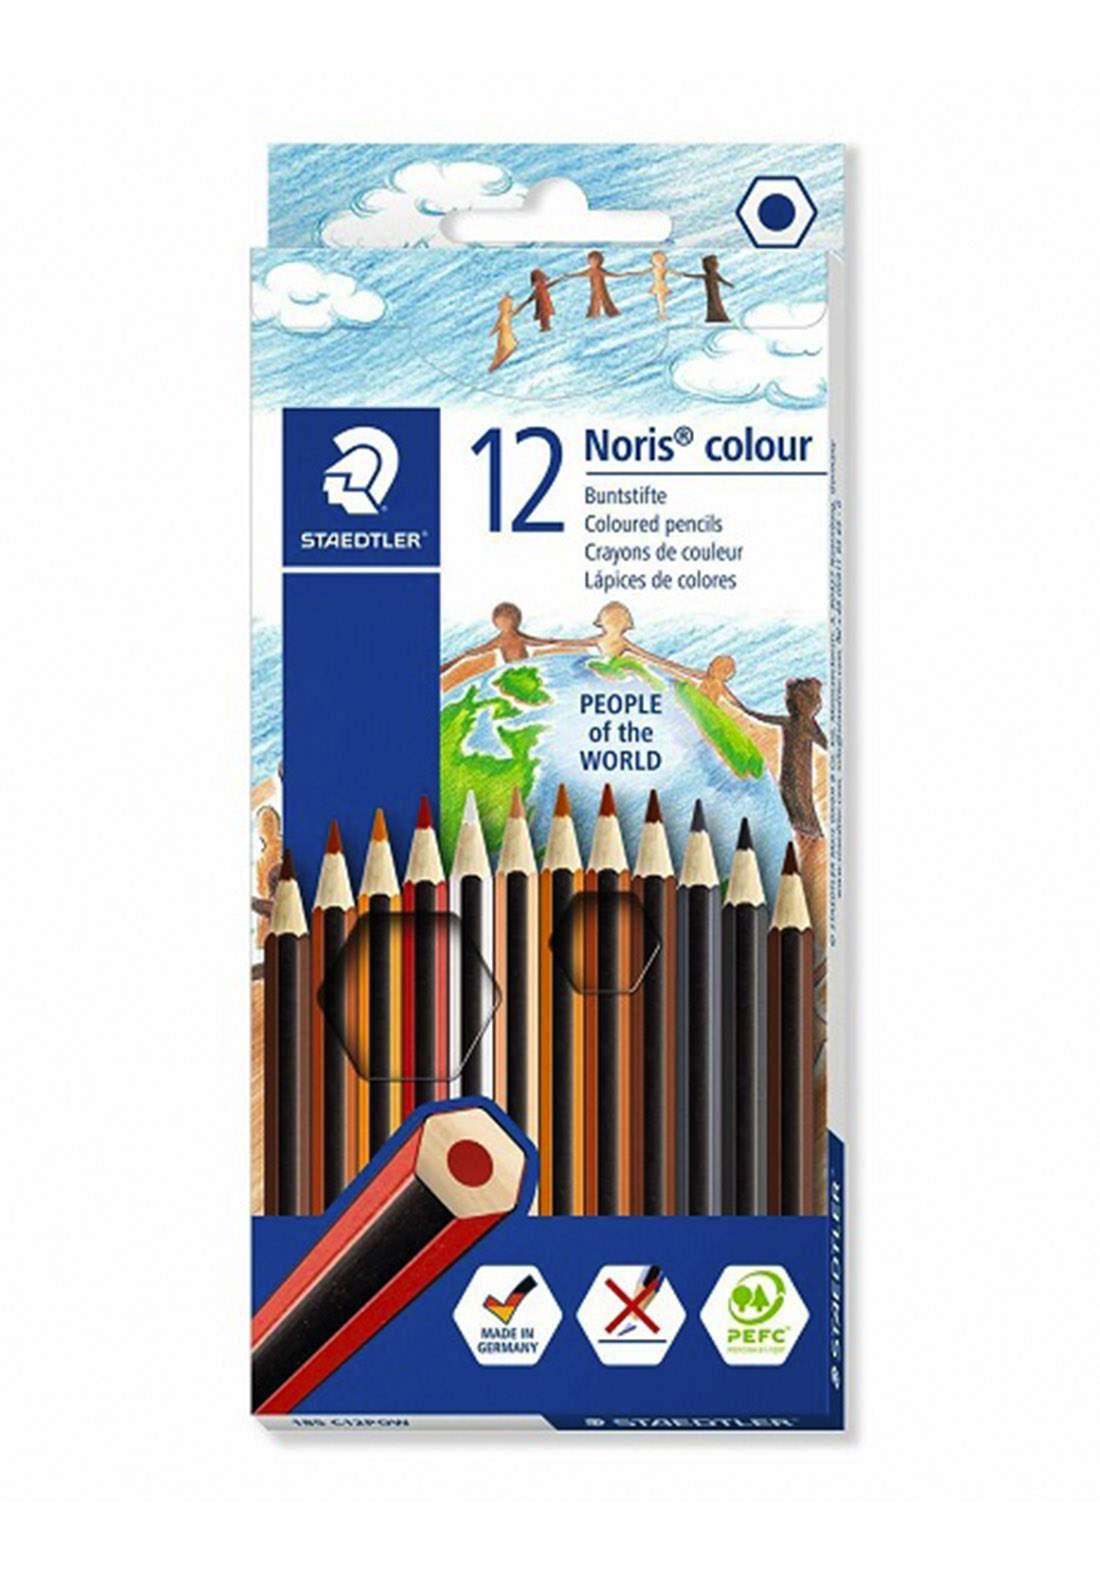 Staedtler 185 C12POW - 12Pcs أقلام رصاص ملونة